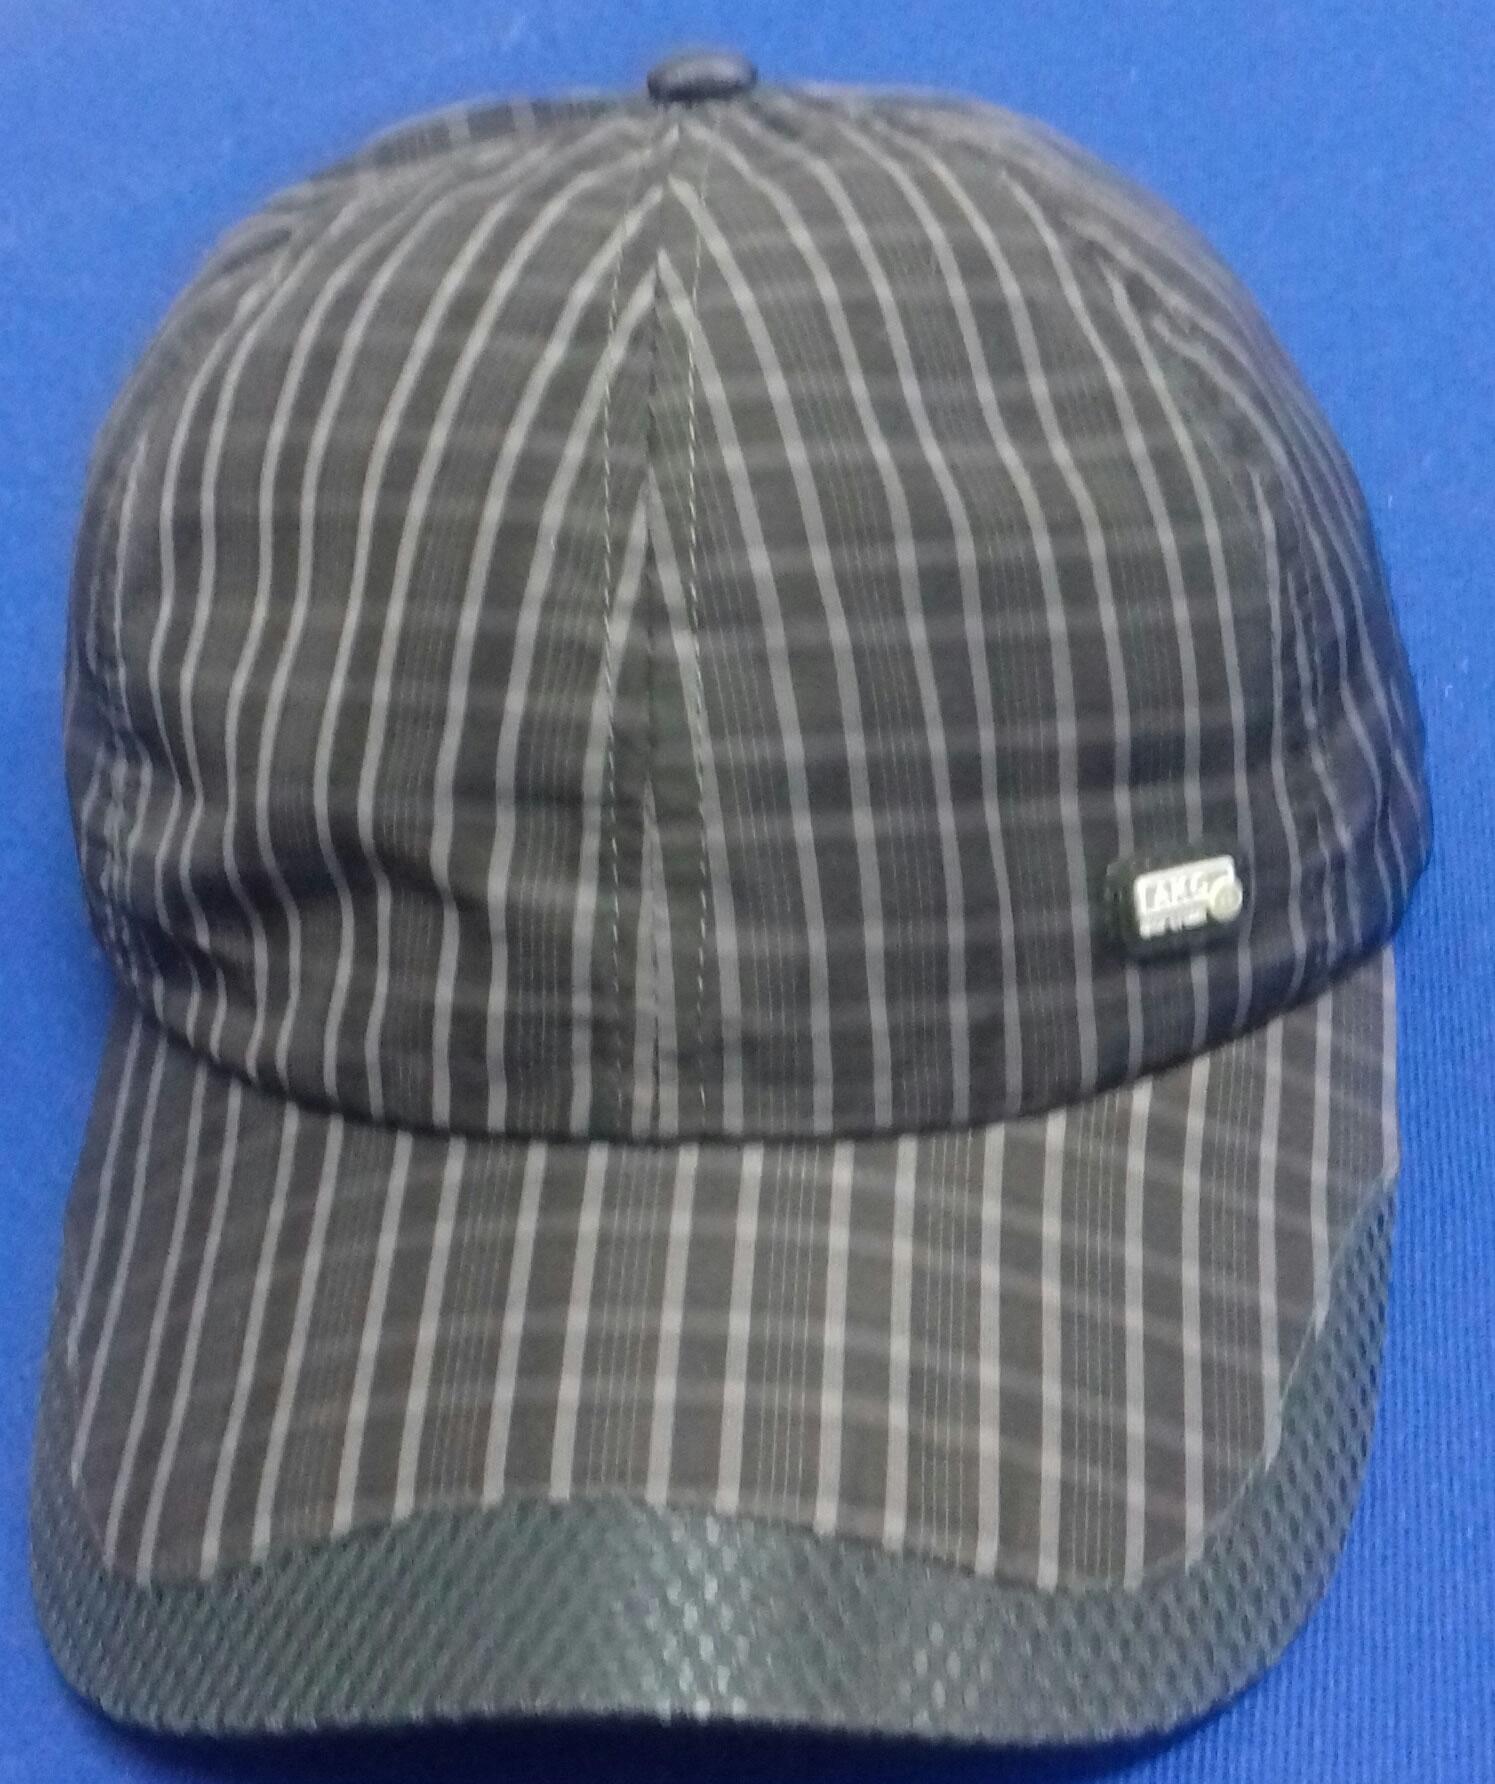 6c1647045612d Baseball striped cap 100% polyester black